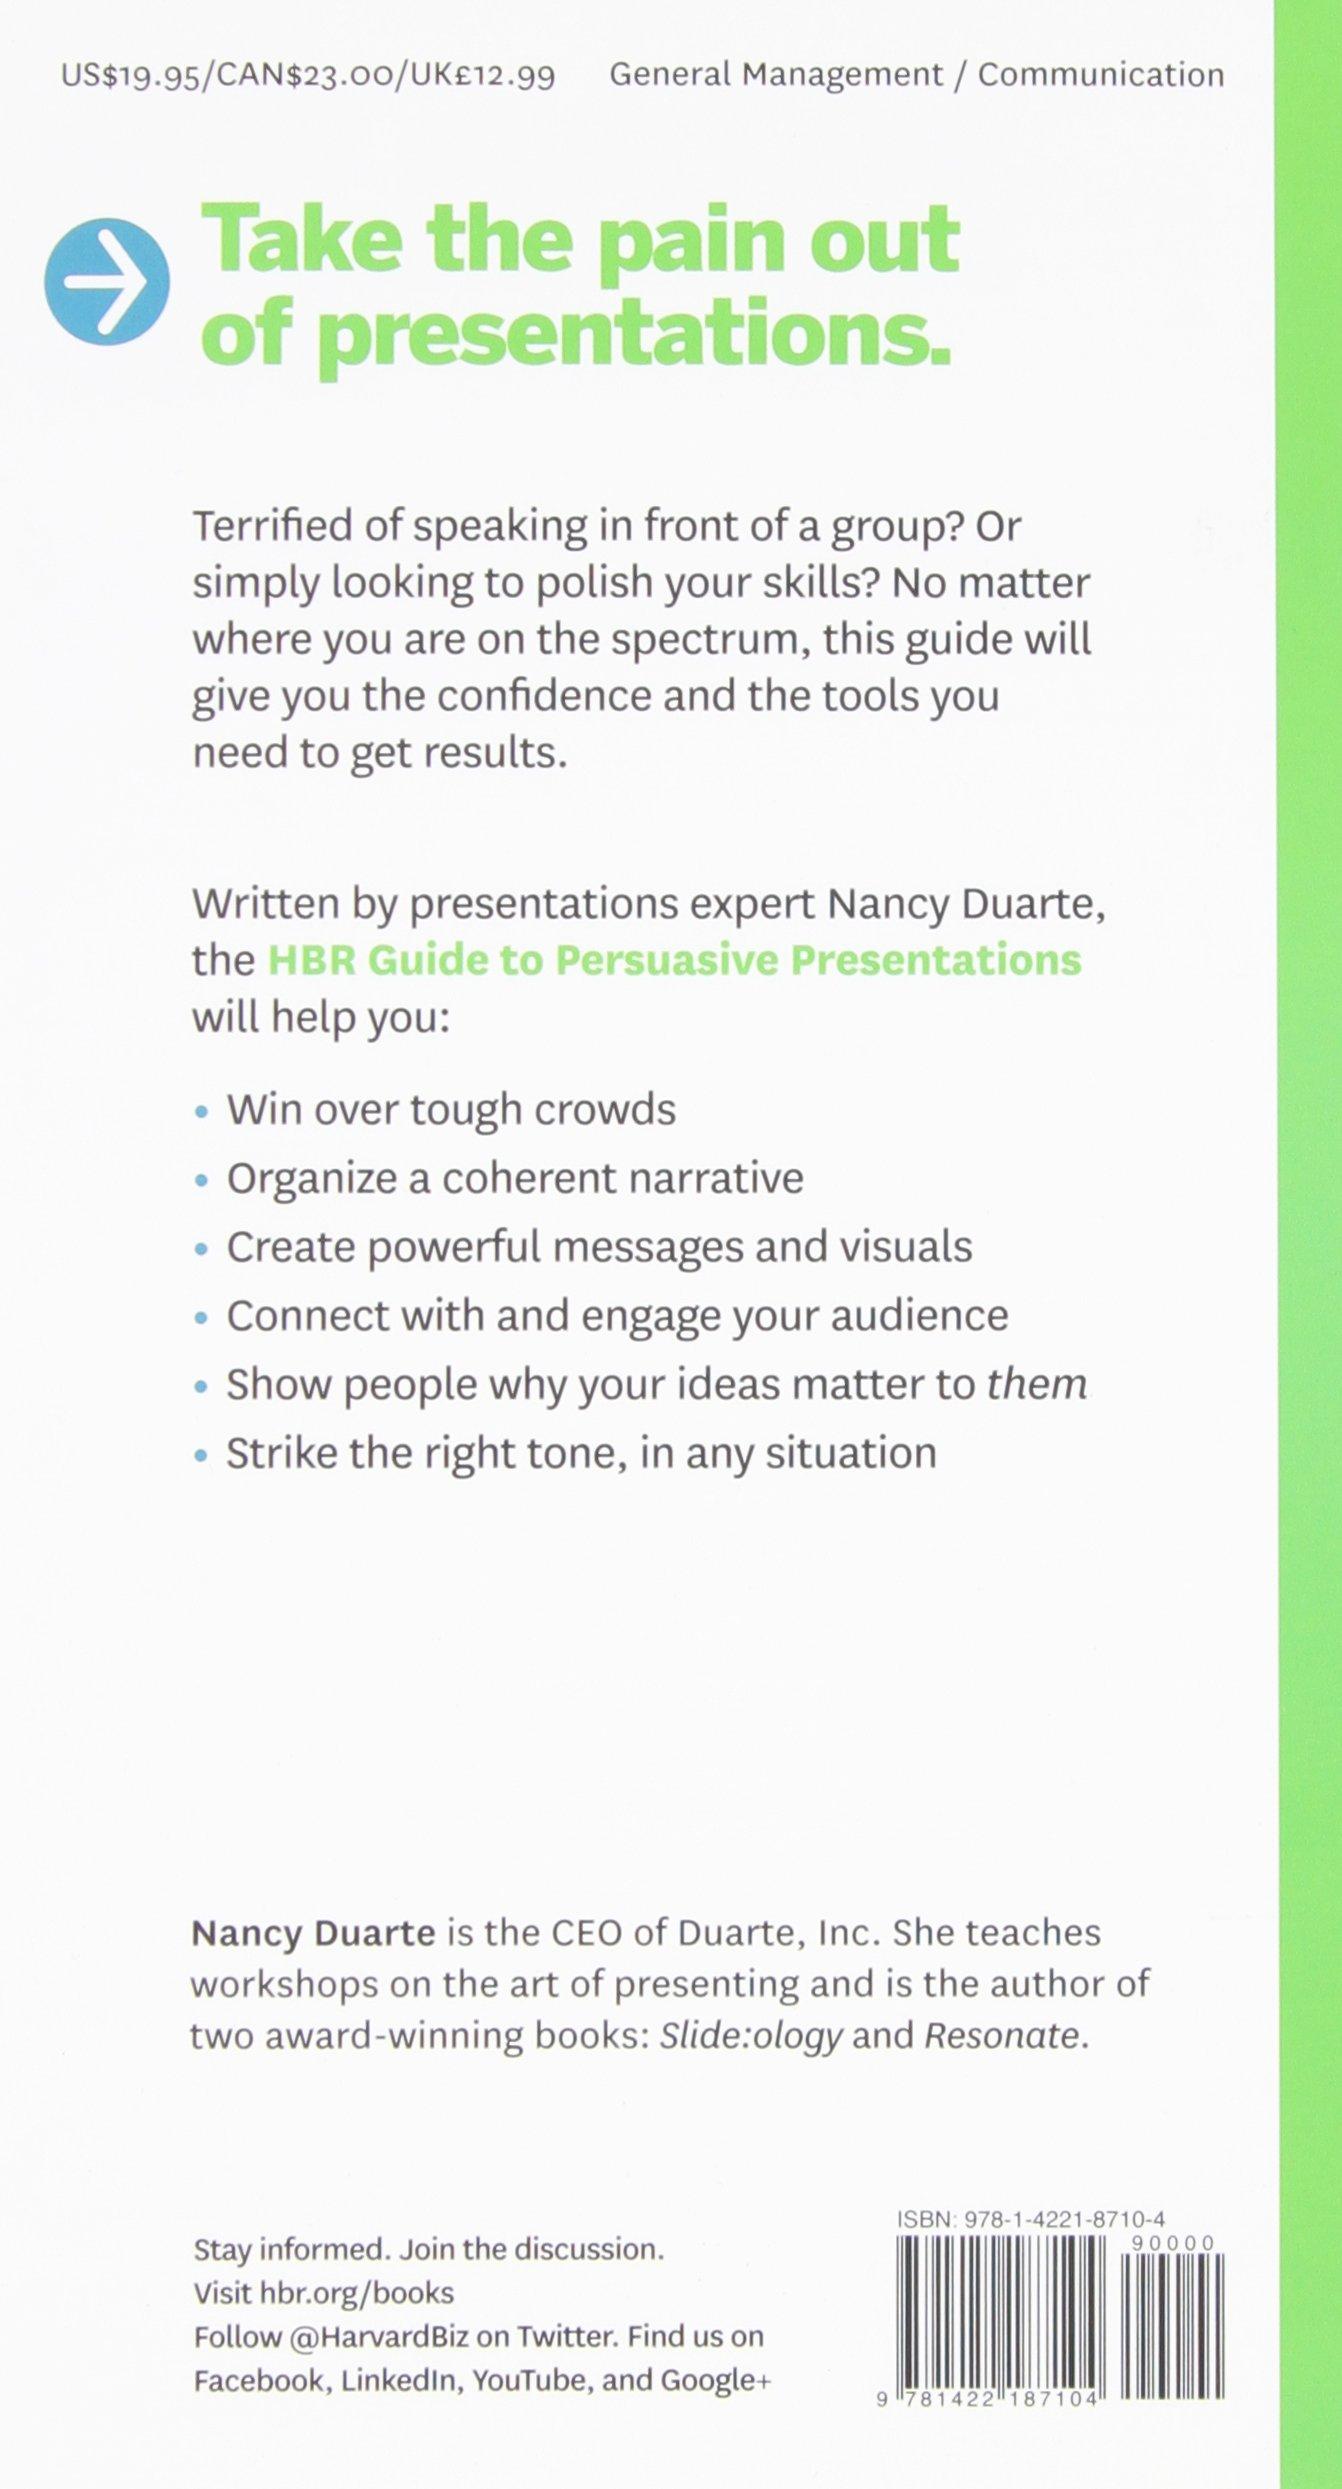 HBR Guide to Persuasive Presentations (HBR Guide Series): Amazon.co.uk: Nancy  Duarte: 9781422187104: Books